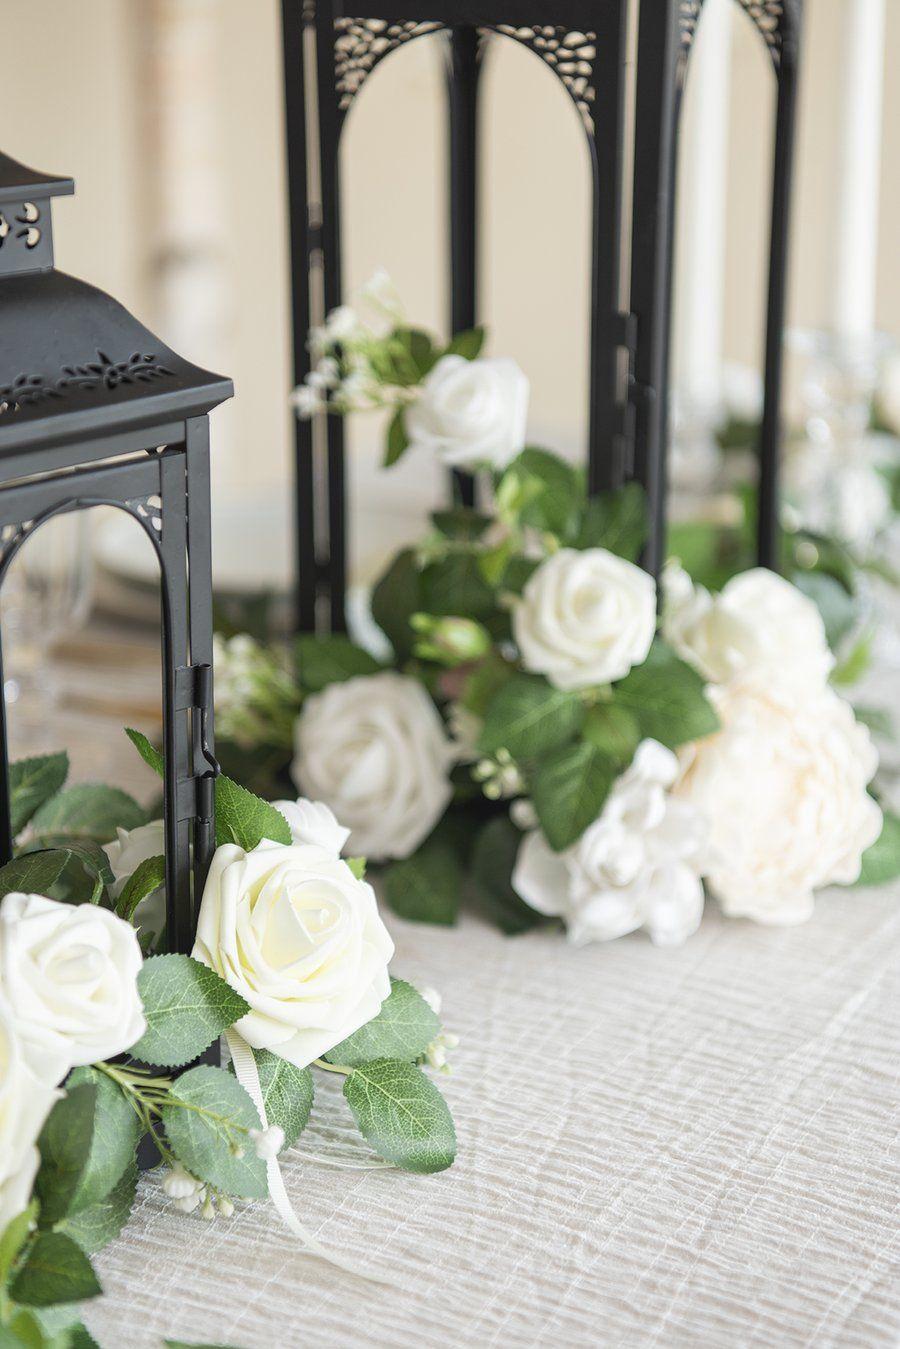 Lantern Floral Arrangements Set Of 6 Ivory In 2020 Paper Flower Bouquet Diy Flower Bouquet Diy Vintage Wedding Decorations